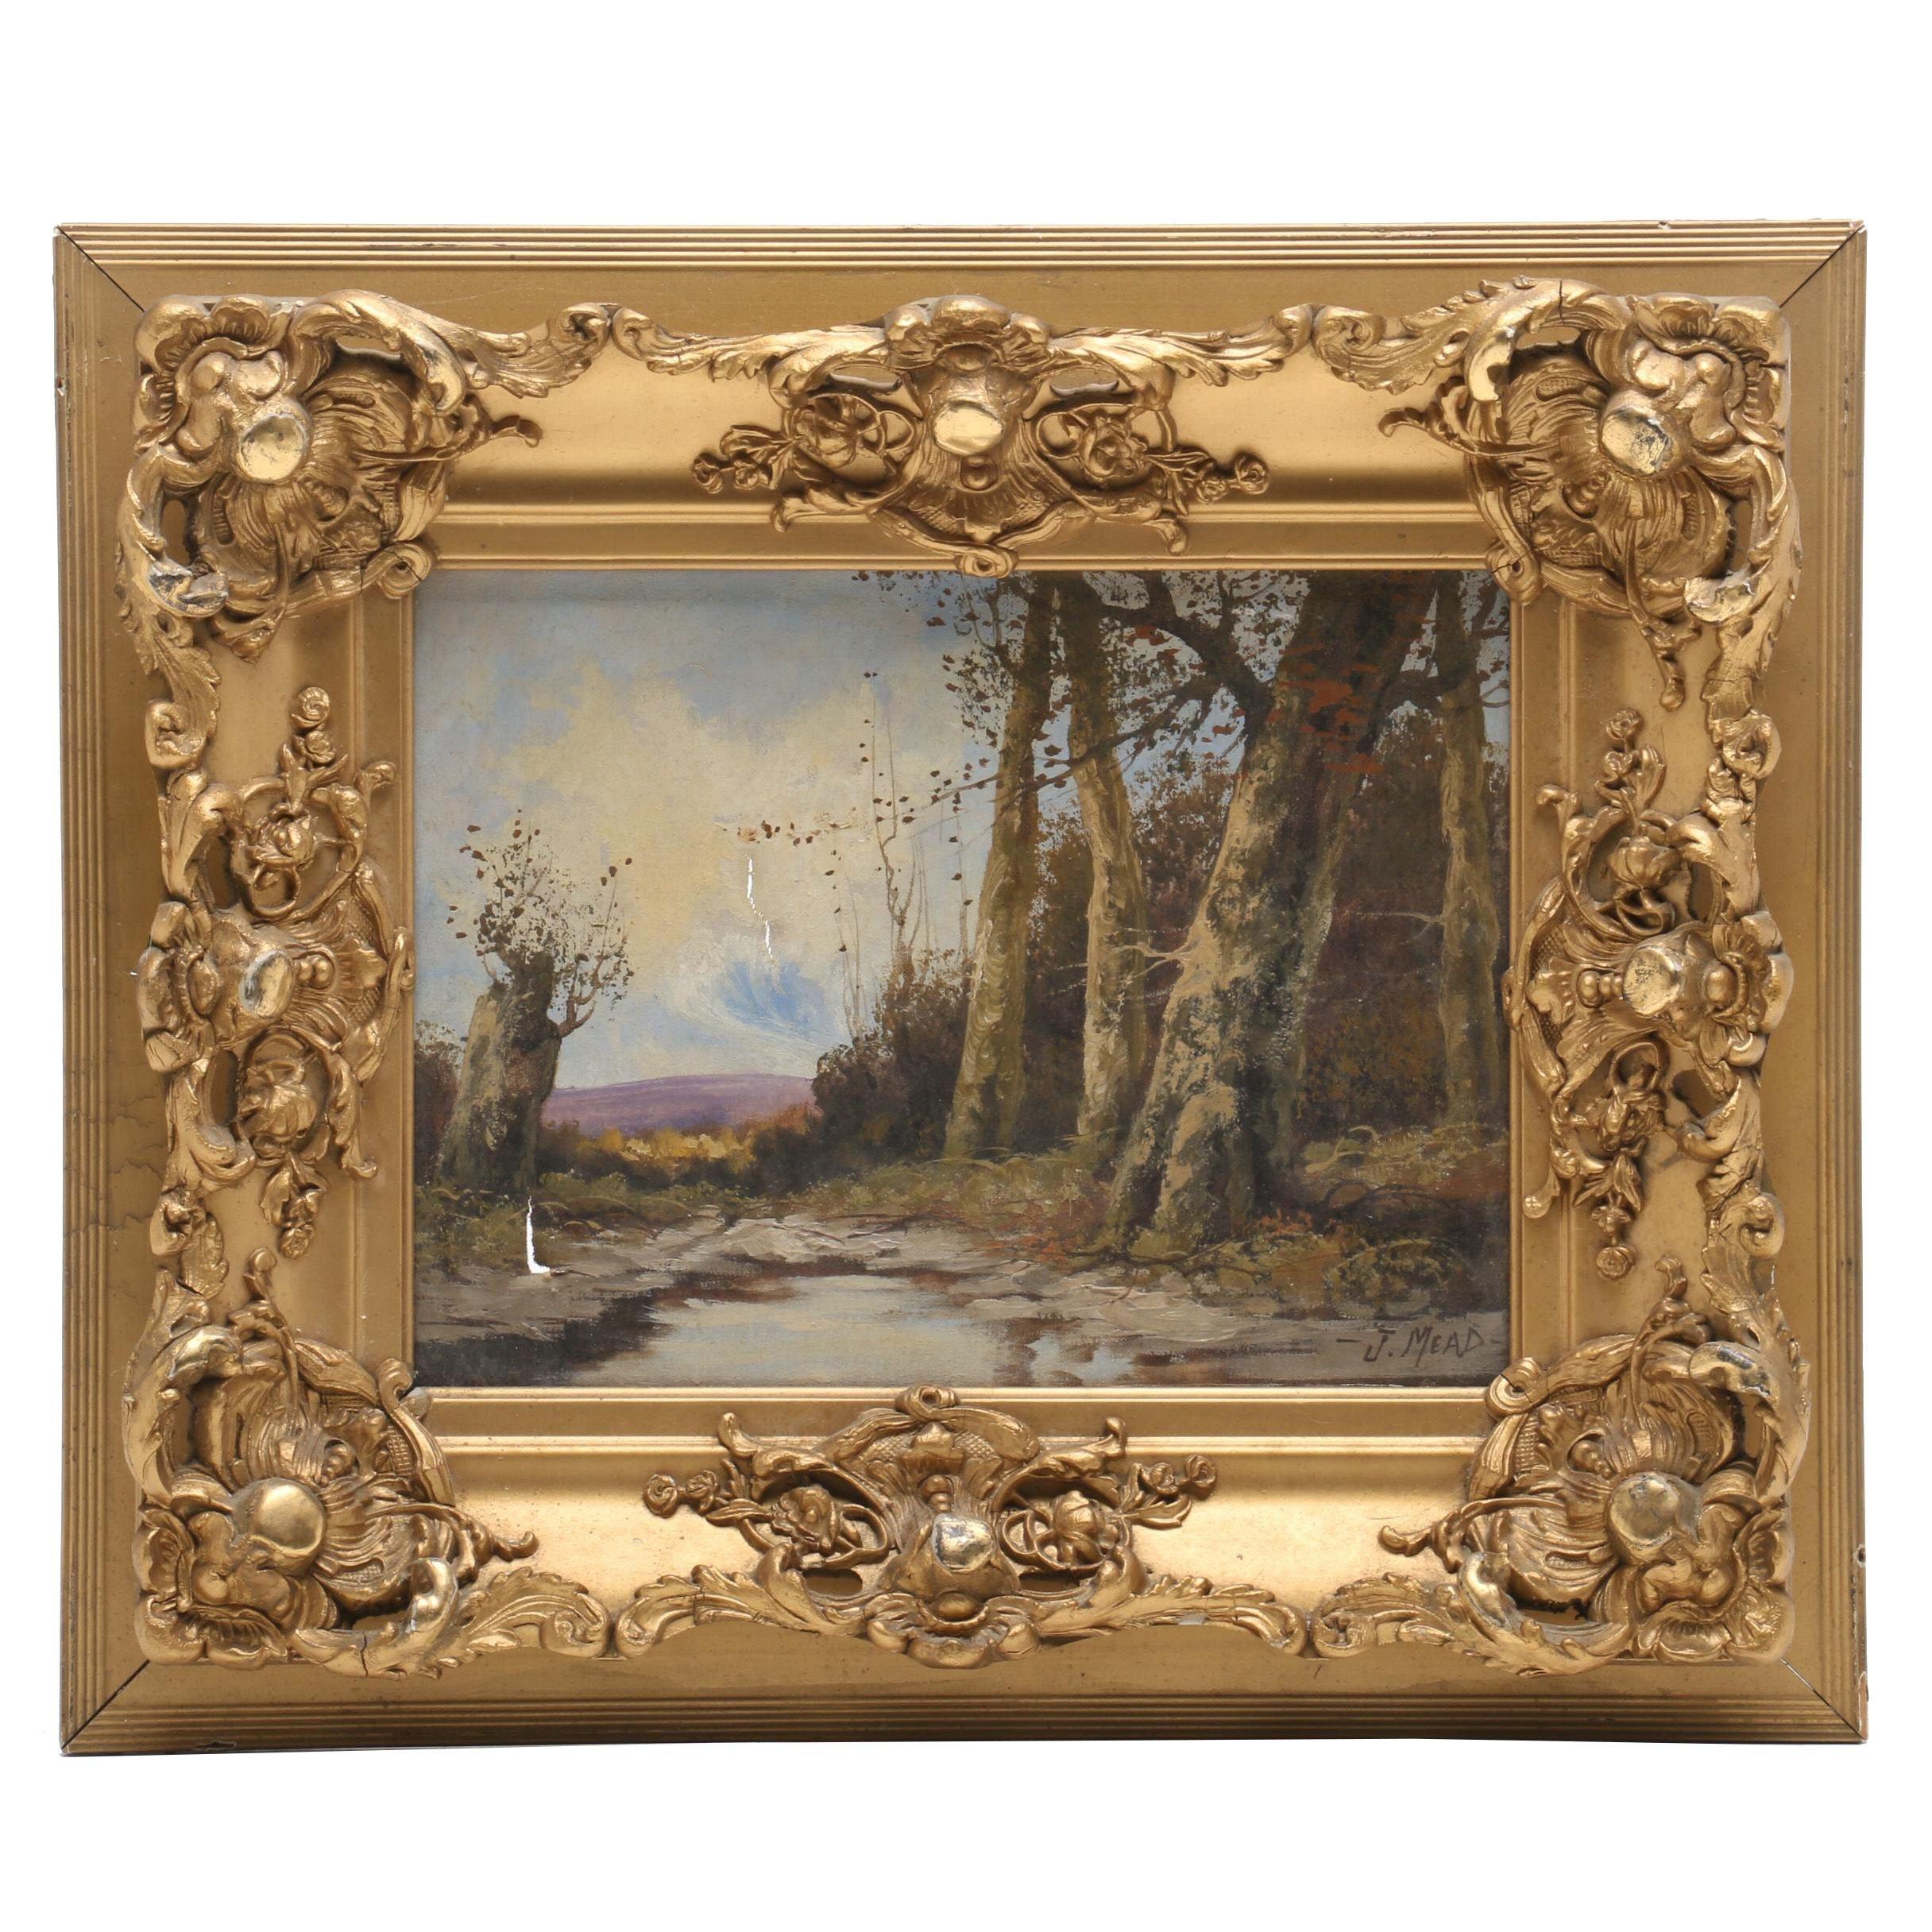 J. Mead 19th Century Oil Painting, Landscape